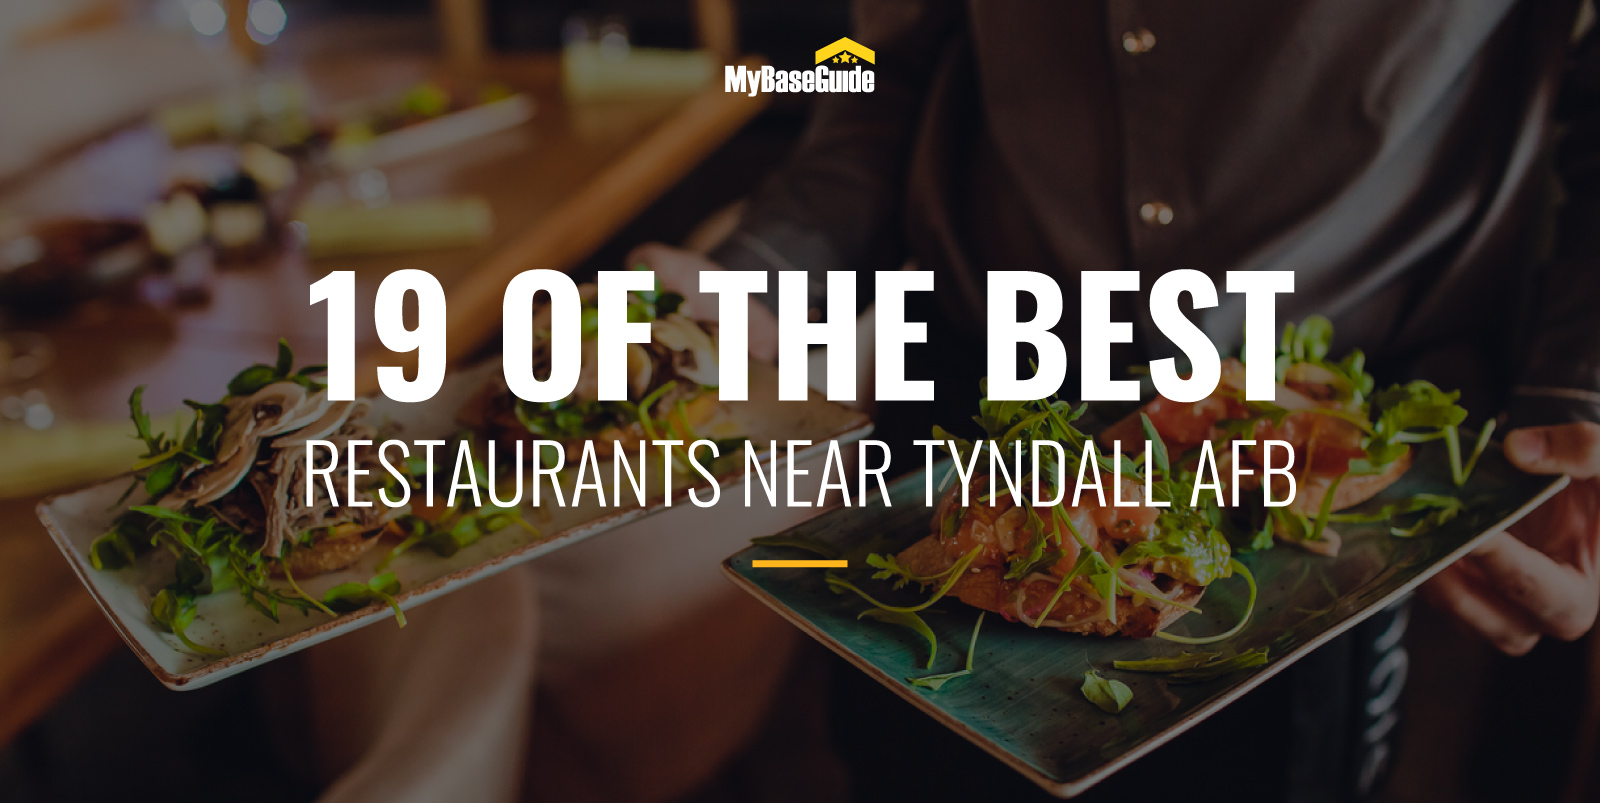 19 of the Best Restaurants Near Tyndall AFB